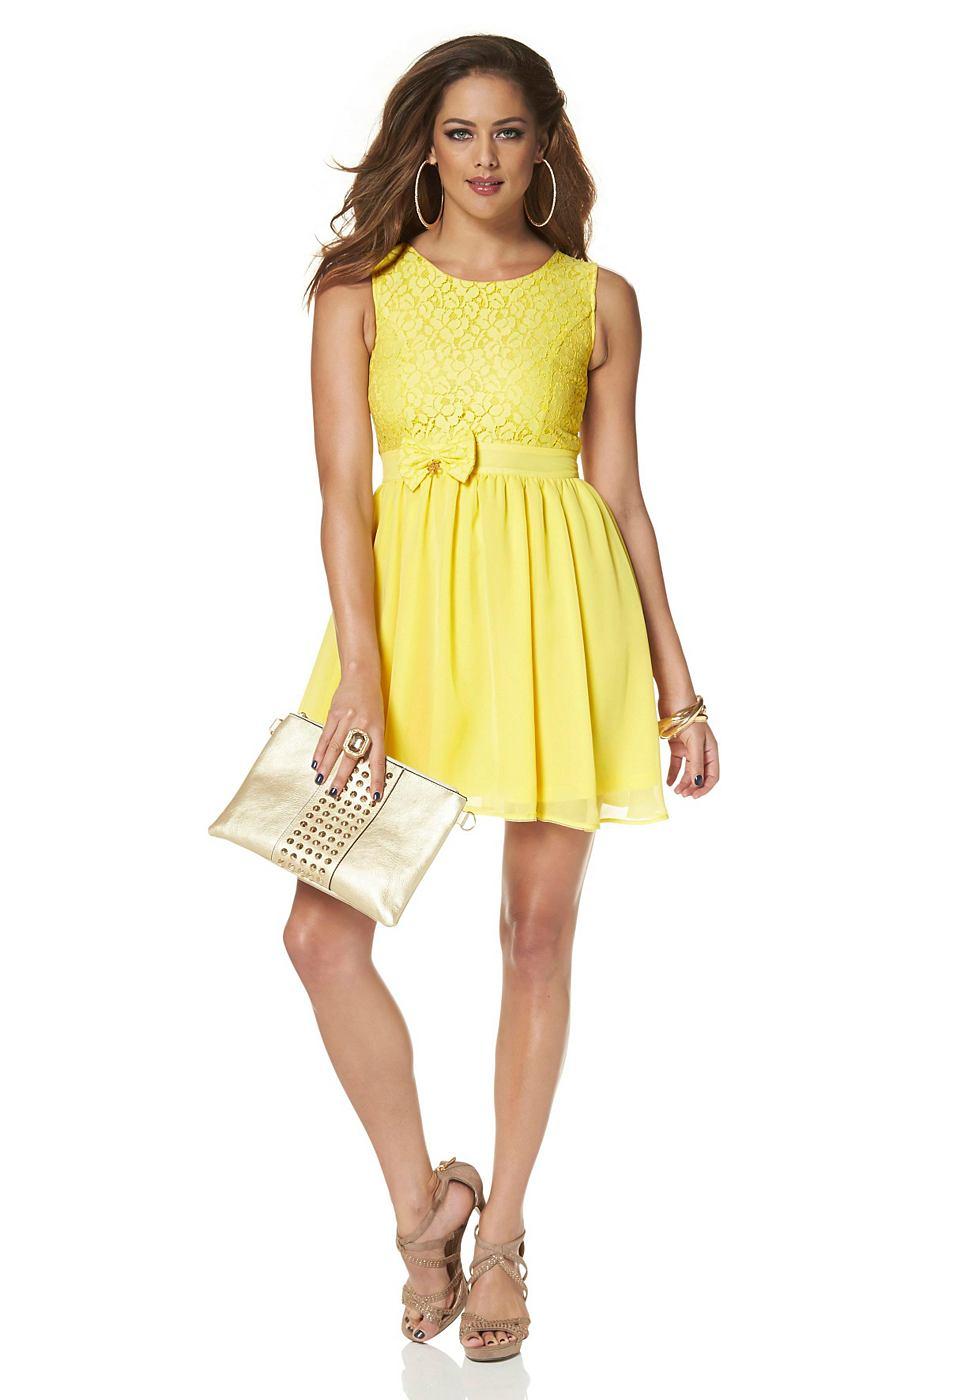 Melrose Geweven jurk van kant en chiffon geel